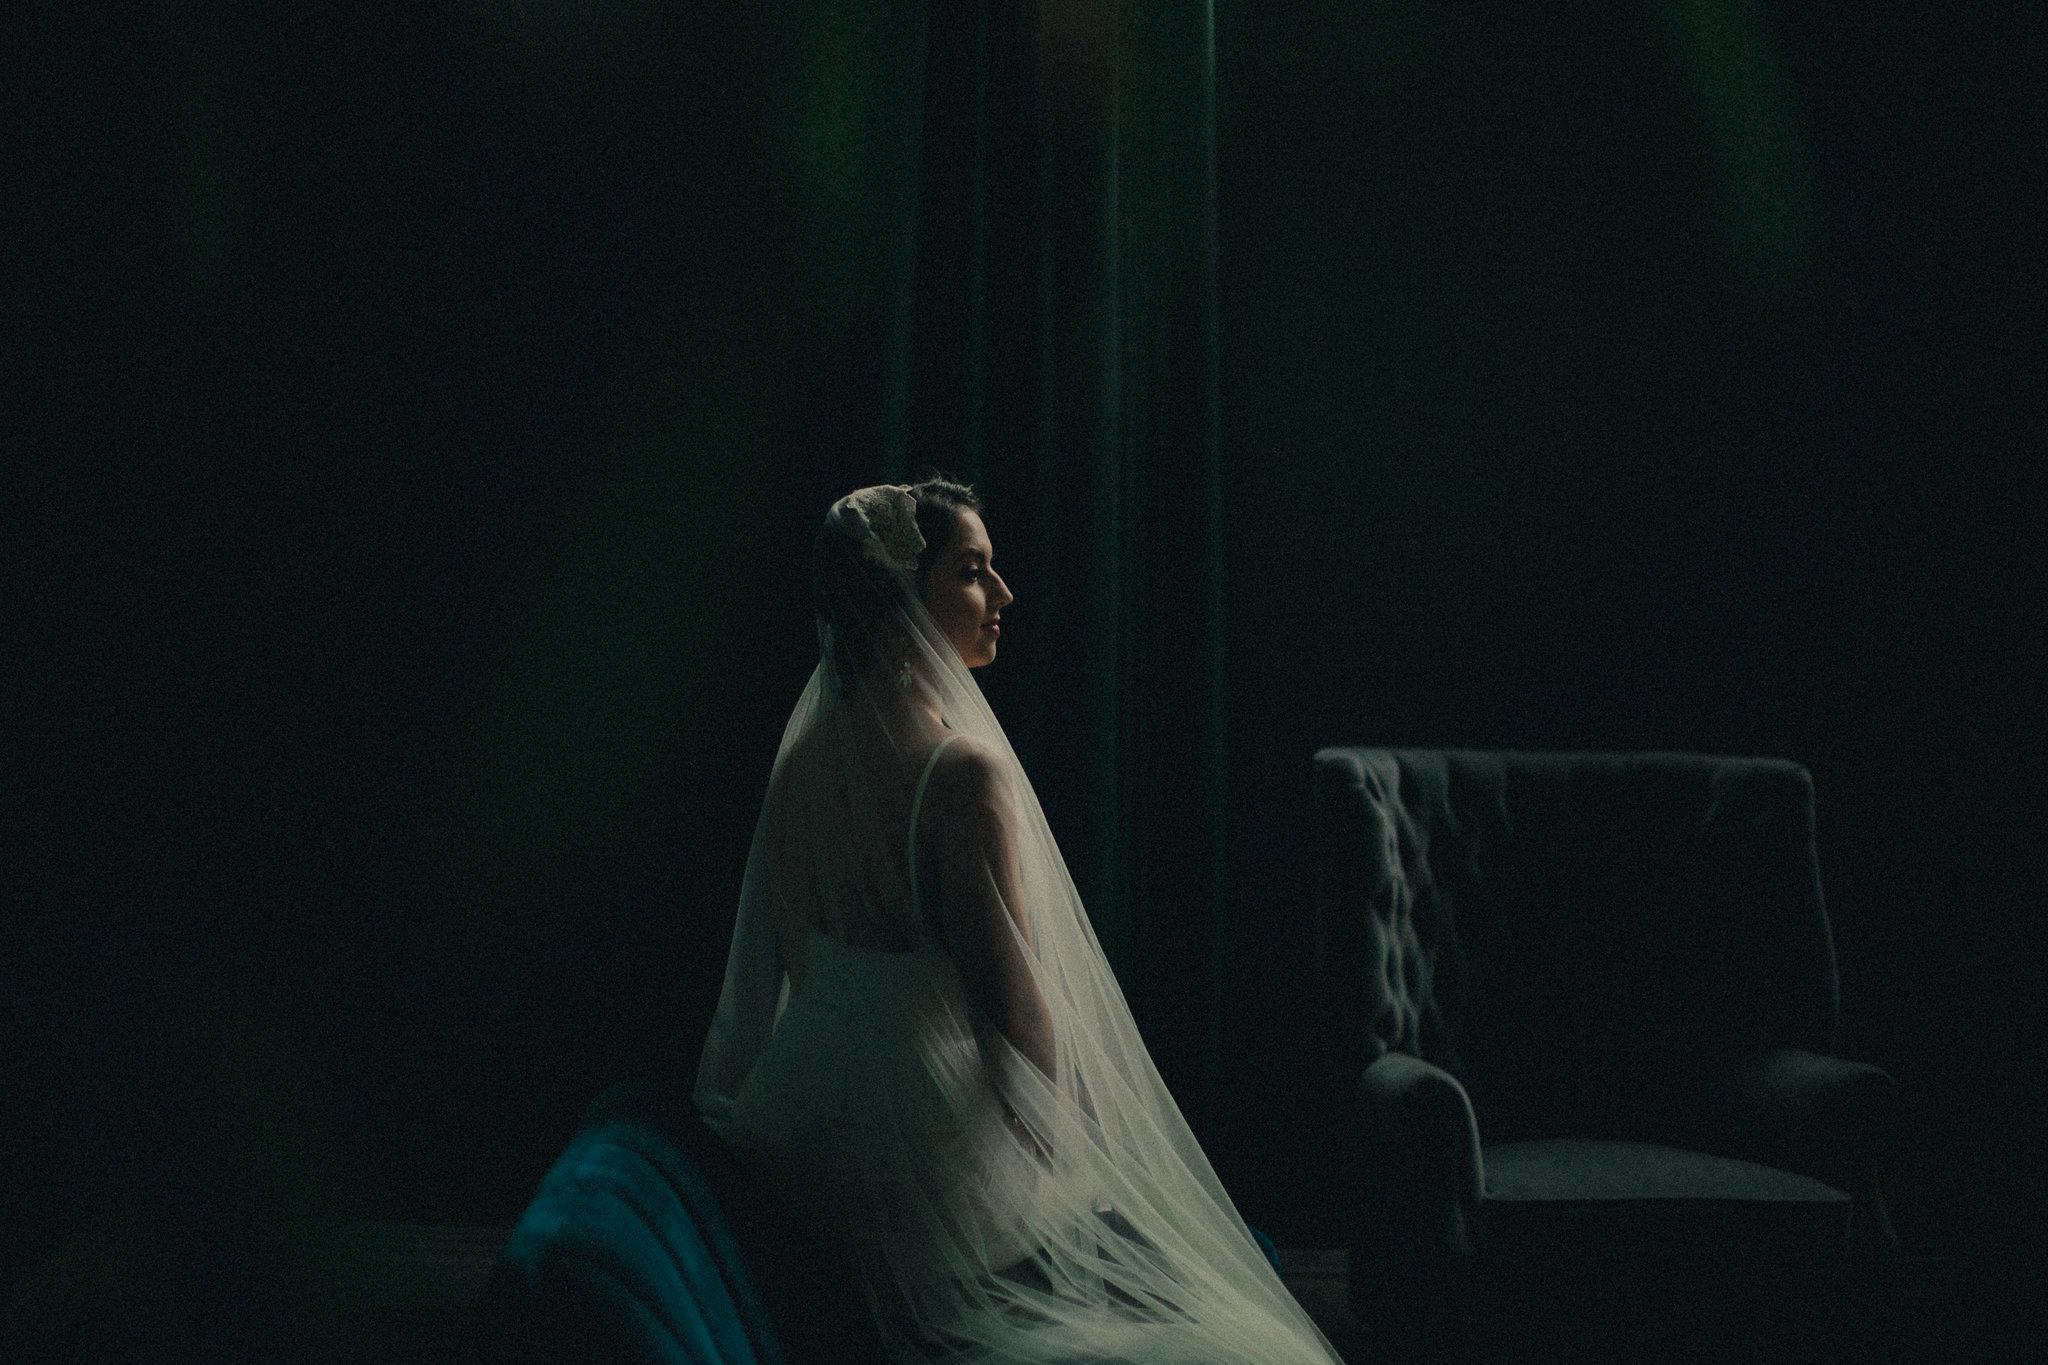 Williamsburg_Hotel_Wedding_Photographer_Chellise_Michael_Photography-306.jpg